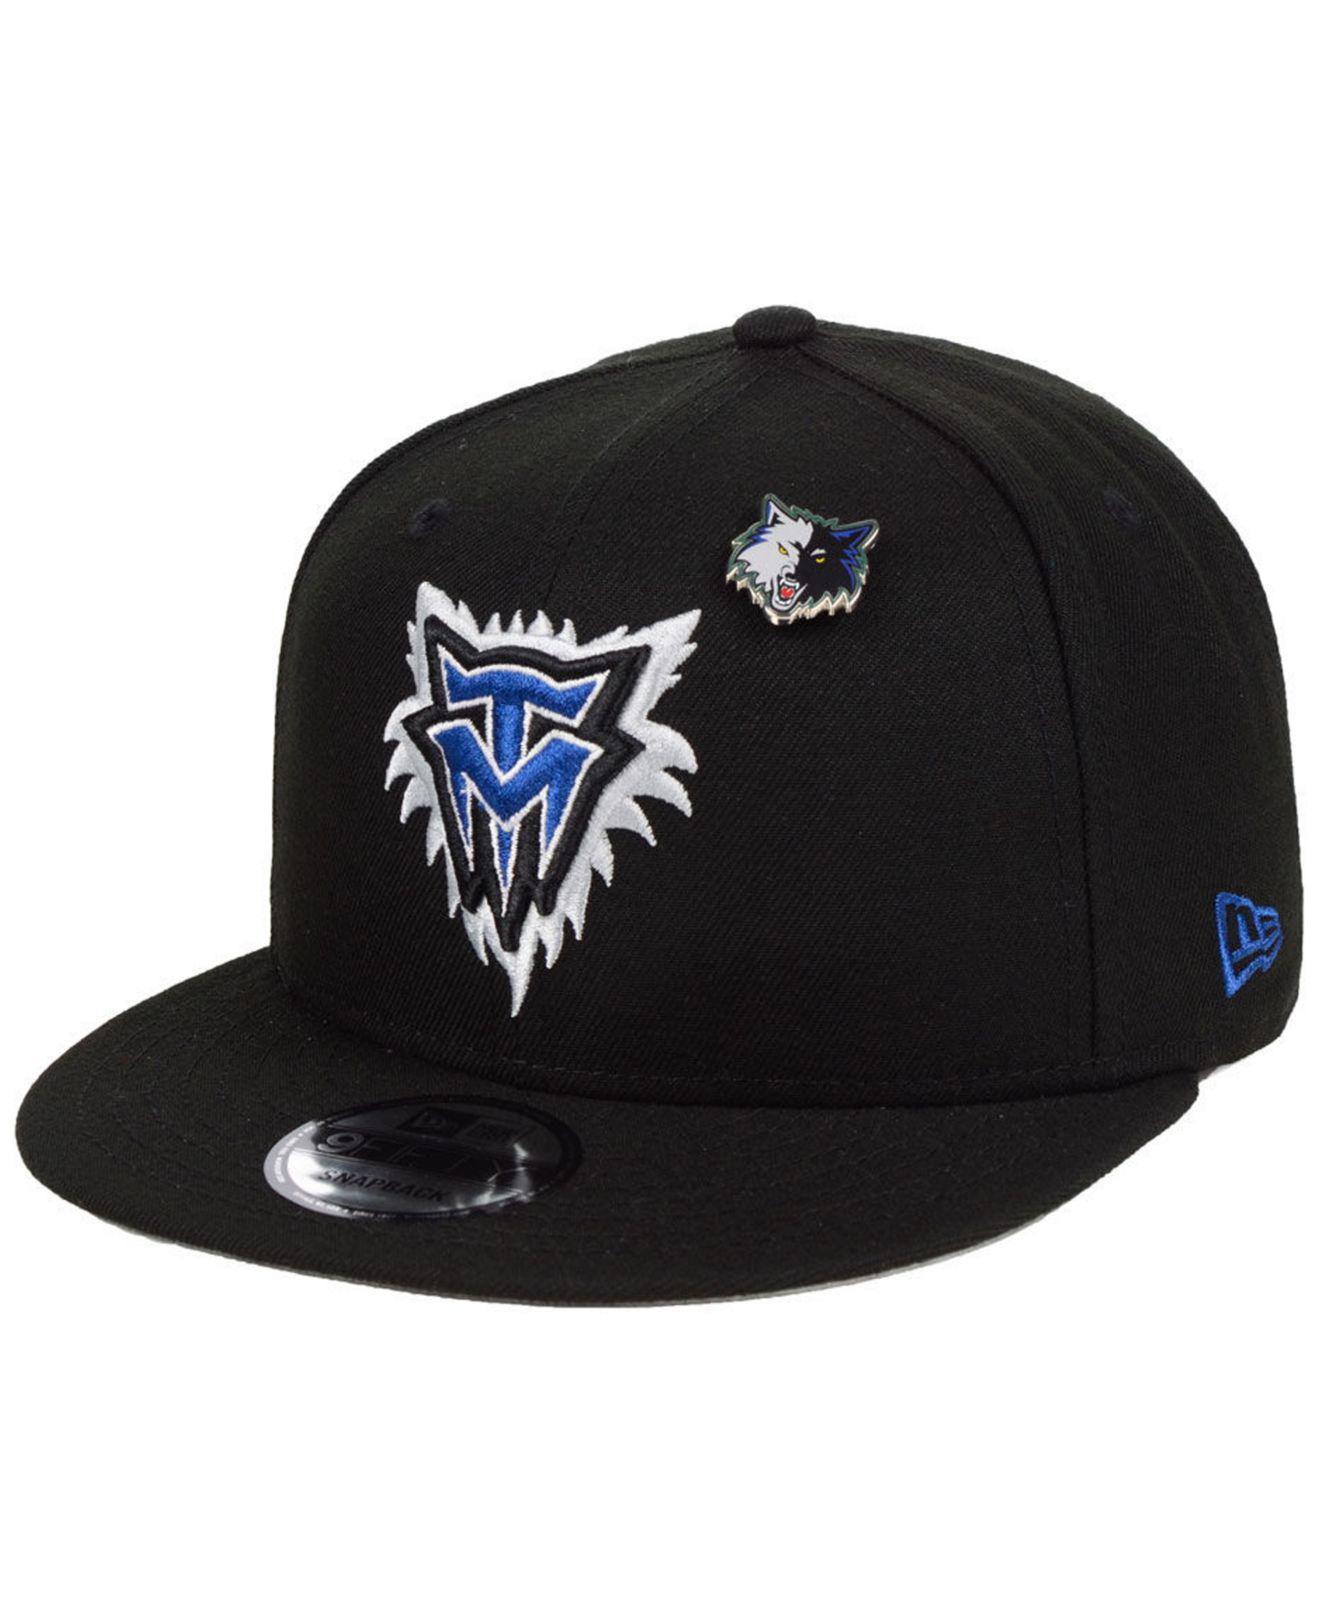 64ffbb13 KTZ. Men's Black Minnesota Timberwolves Hardwood Classic Nights Pin 9fifty  Snapback Cap